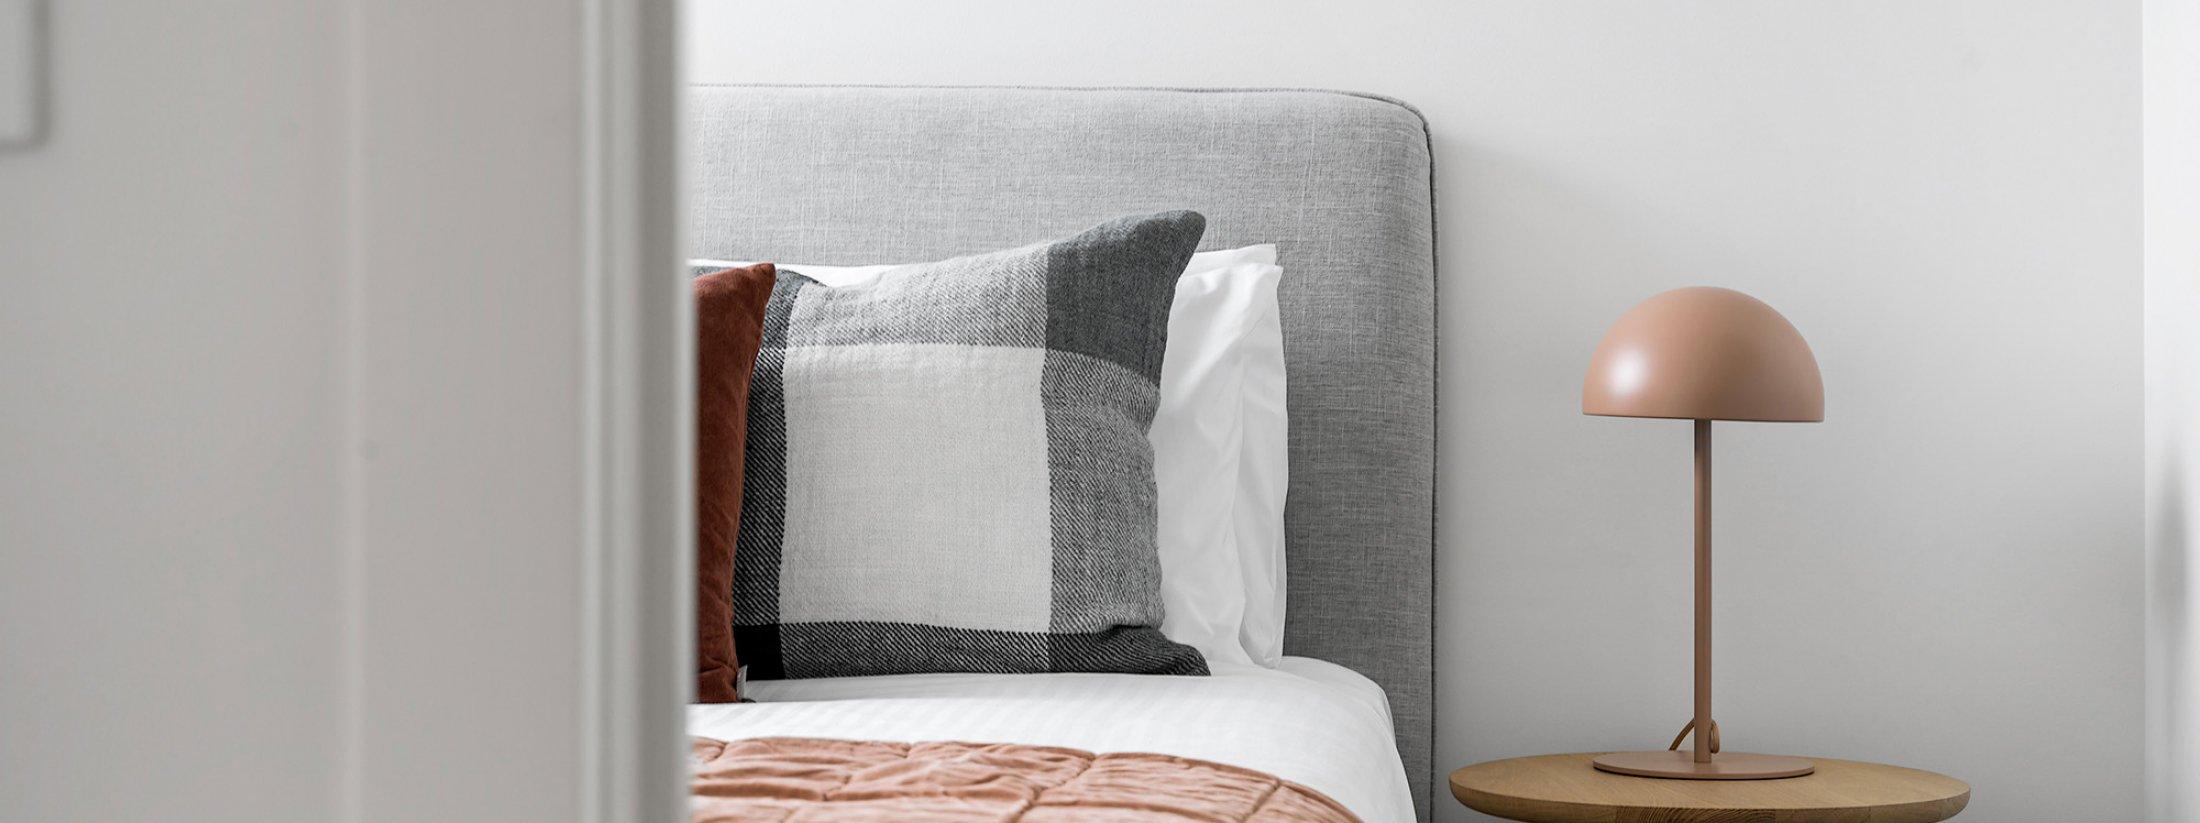 Axel Apartments - The Radnor - Glen Iris - Master Bedroom c